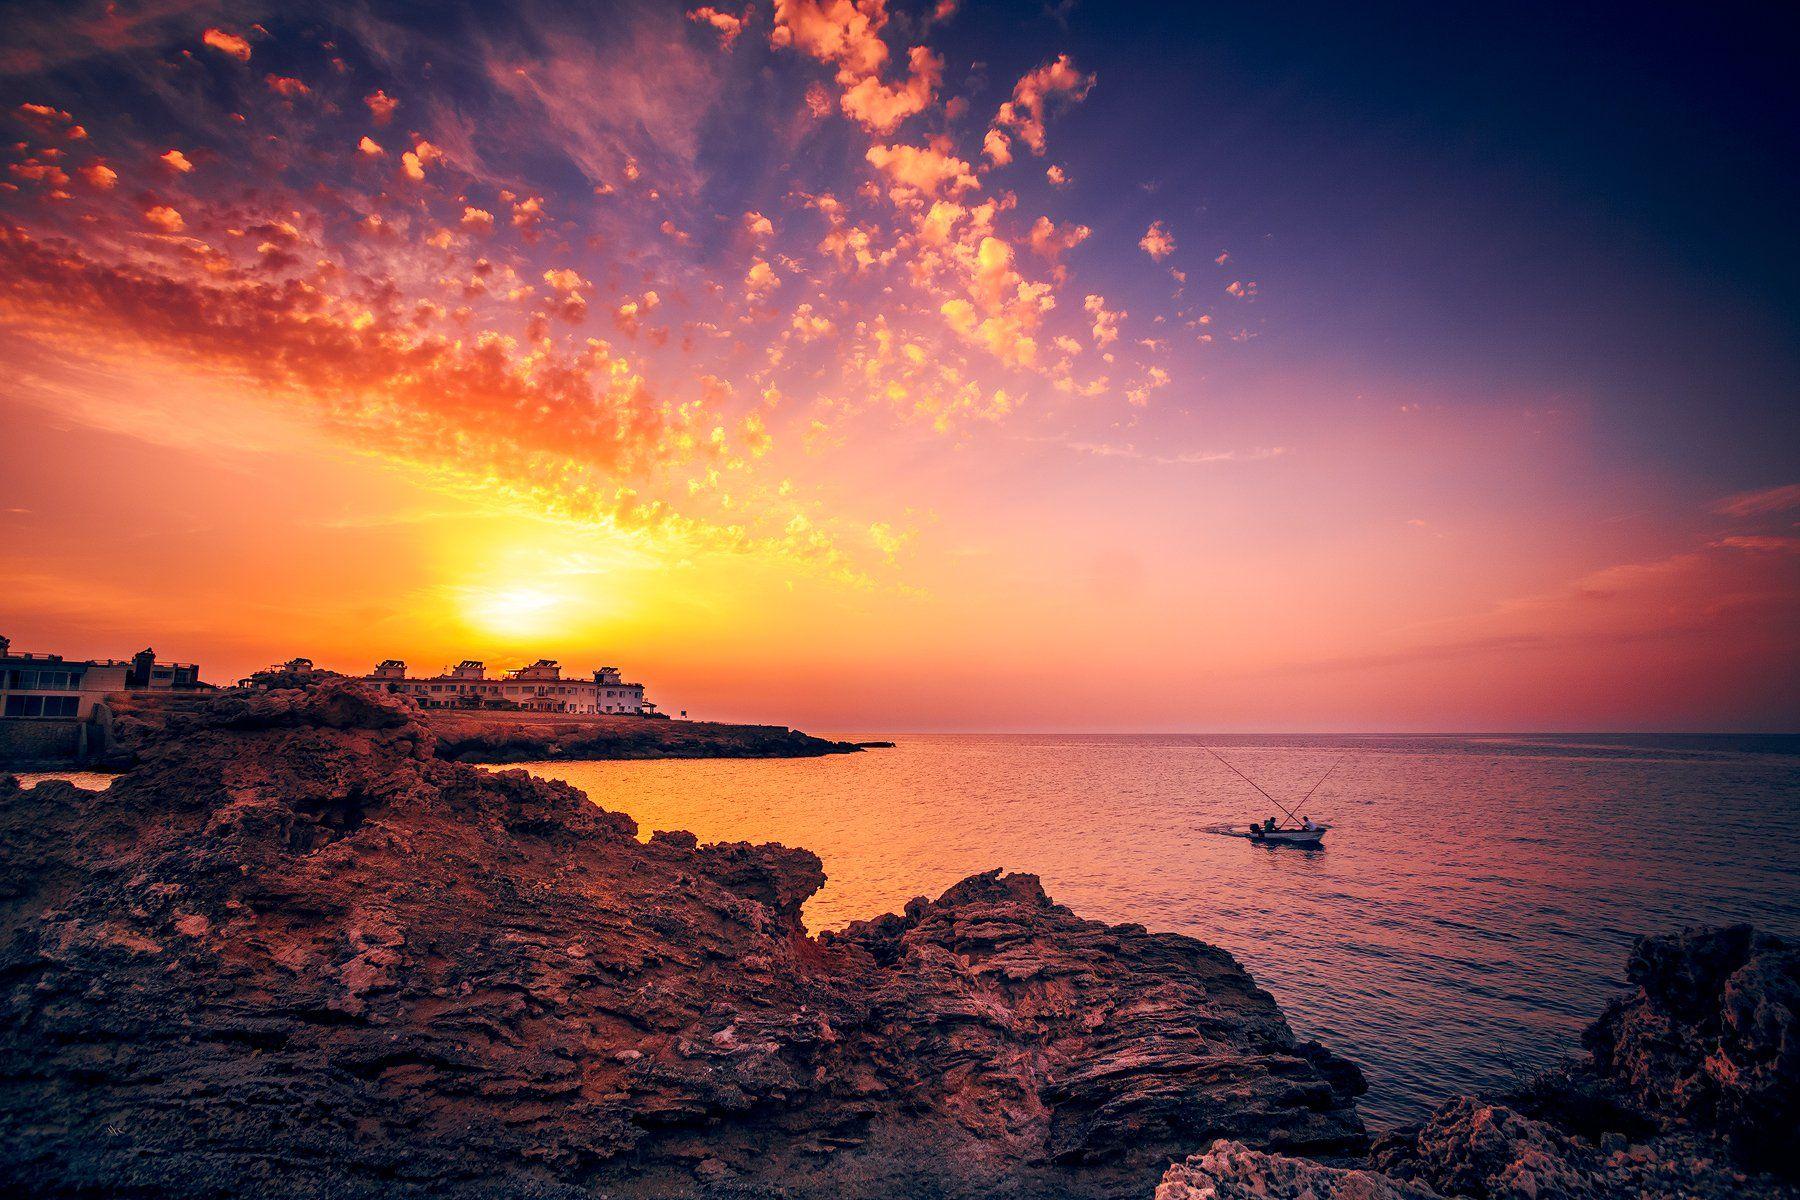 cyprus, sunset, colors, boat, Руслан Болгов (Axe)